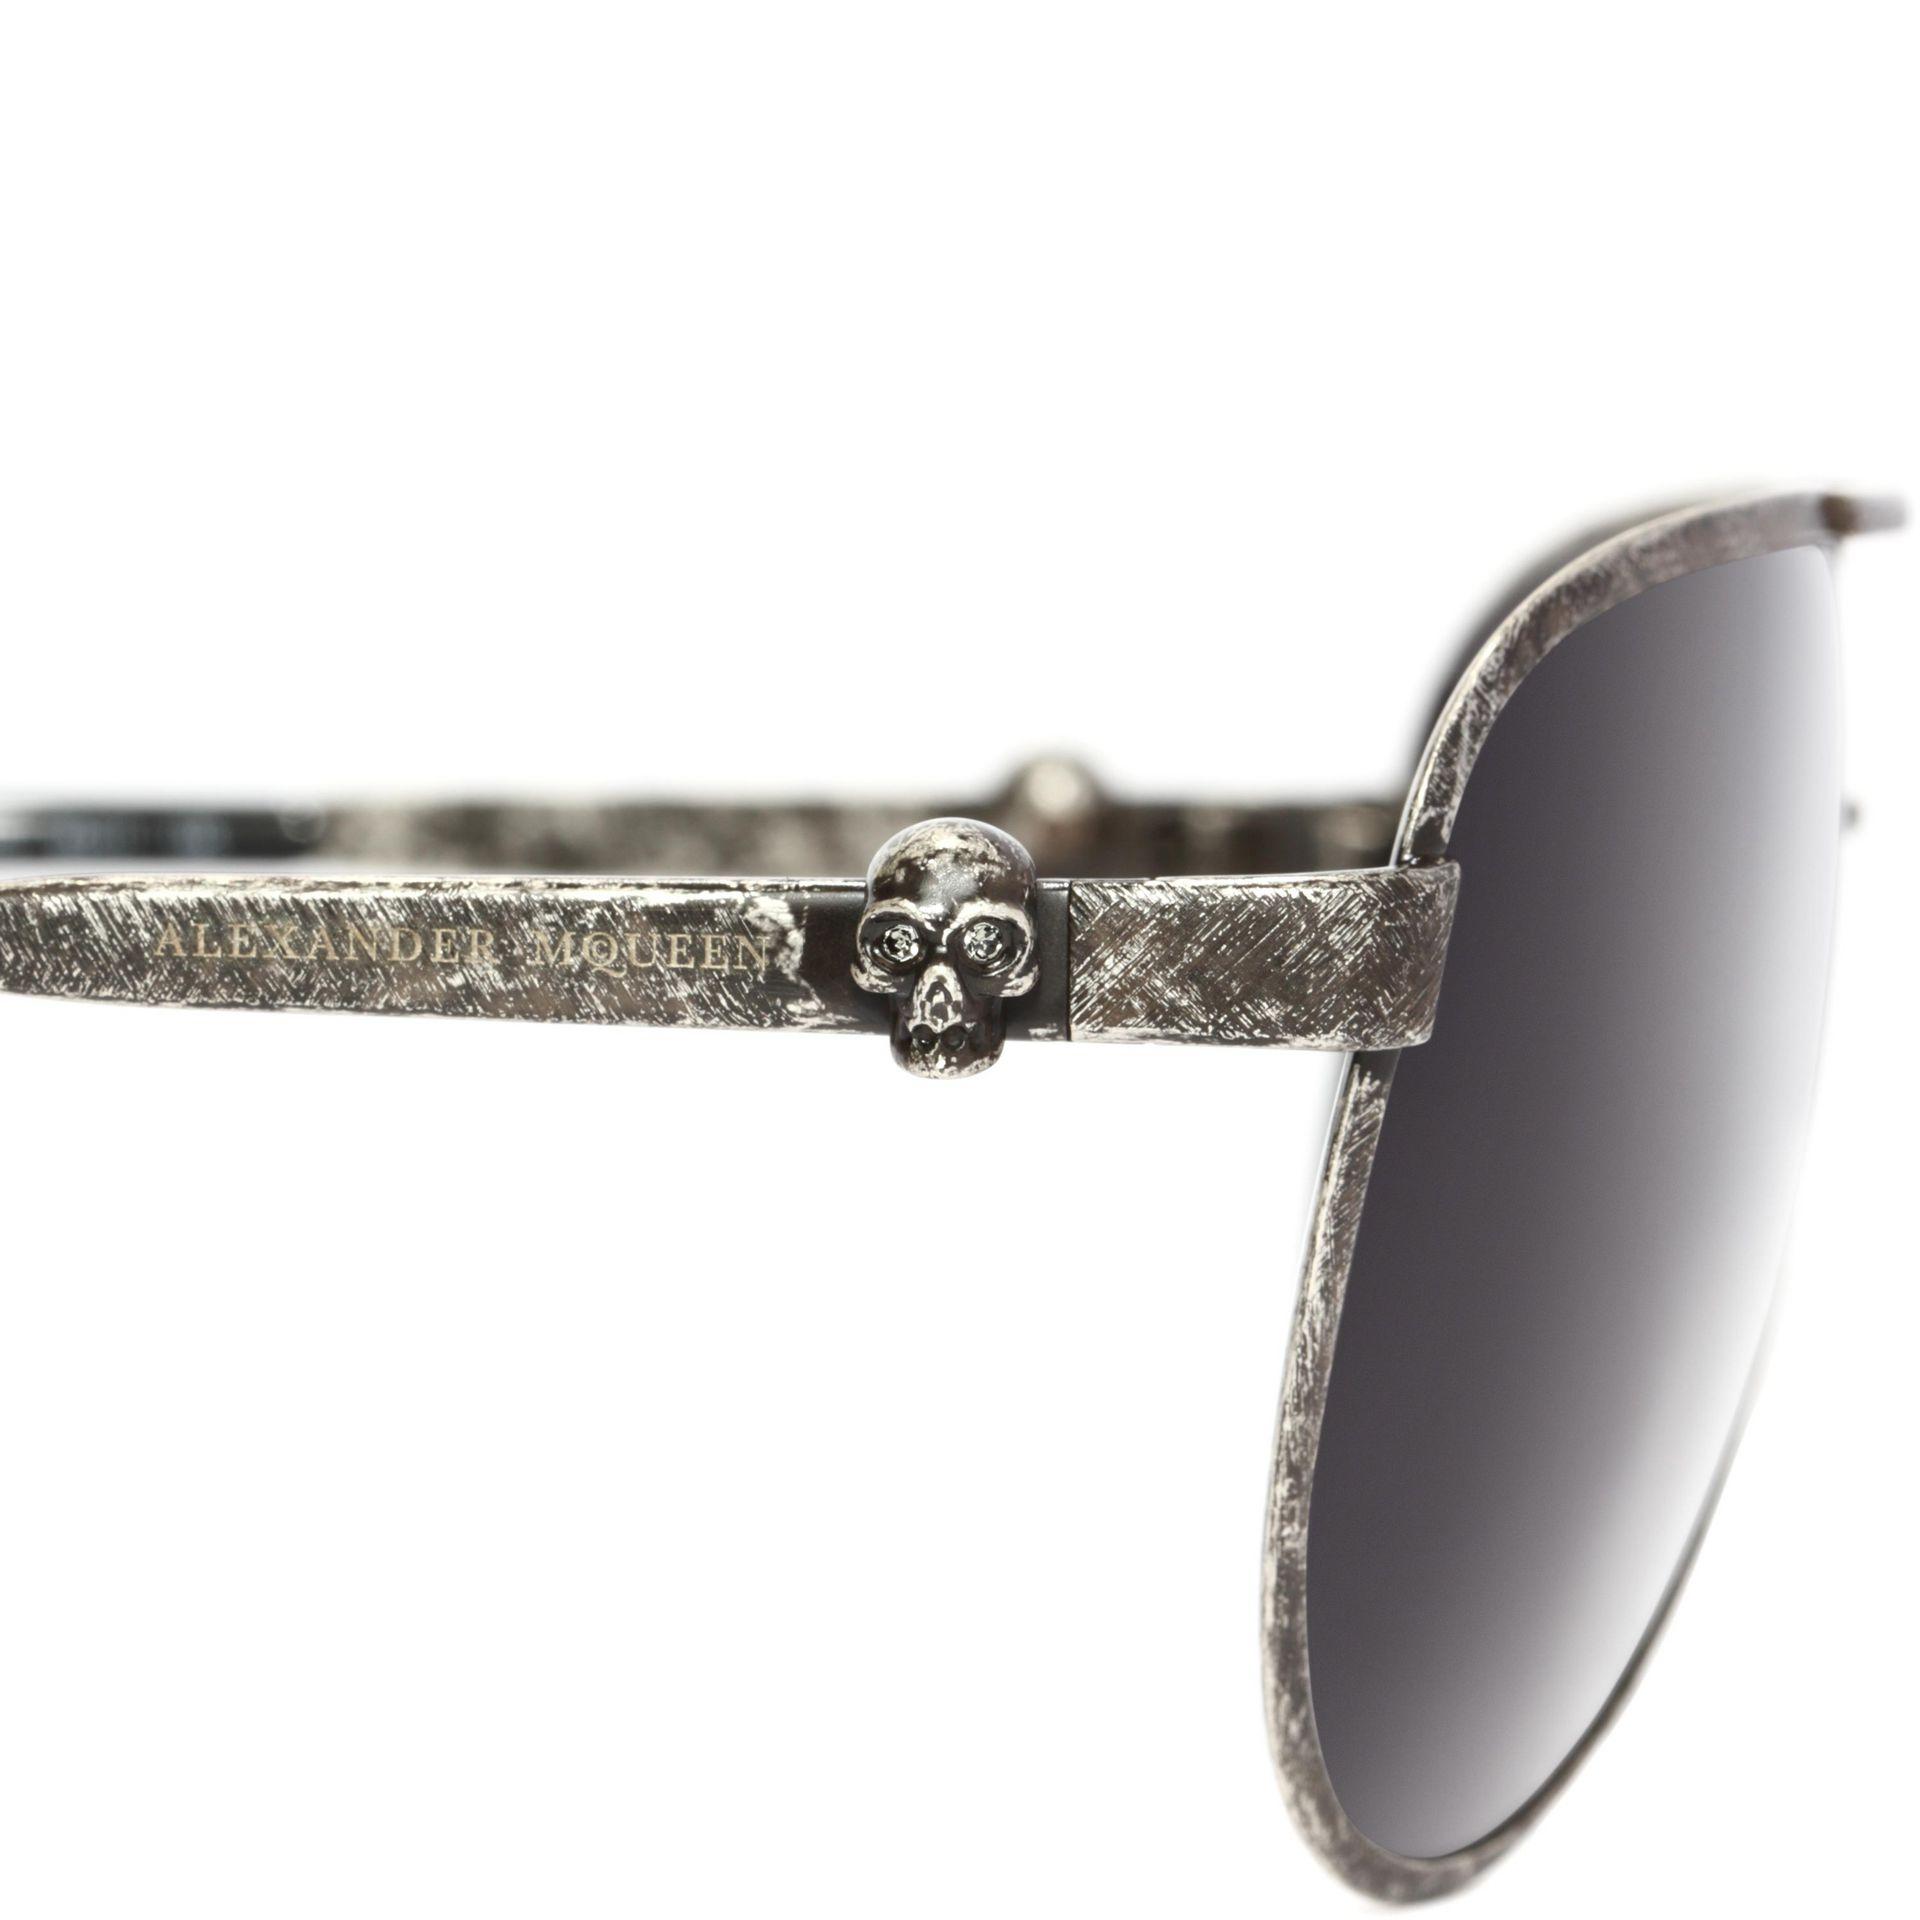 5938b56b59a Lyst - Alexander McQueen Metallic Skull Pilot Sunglasses in Gray for Men